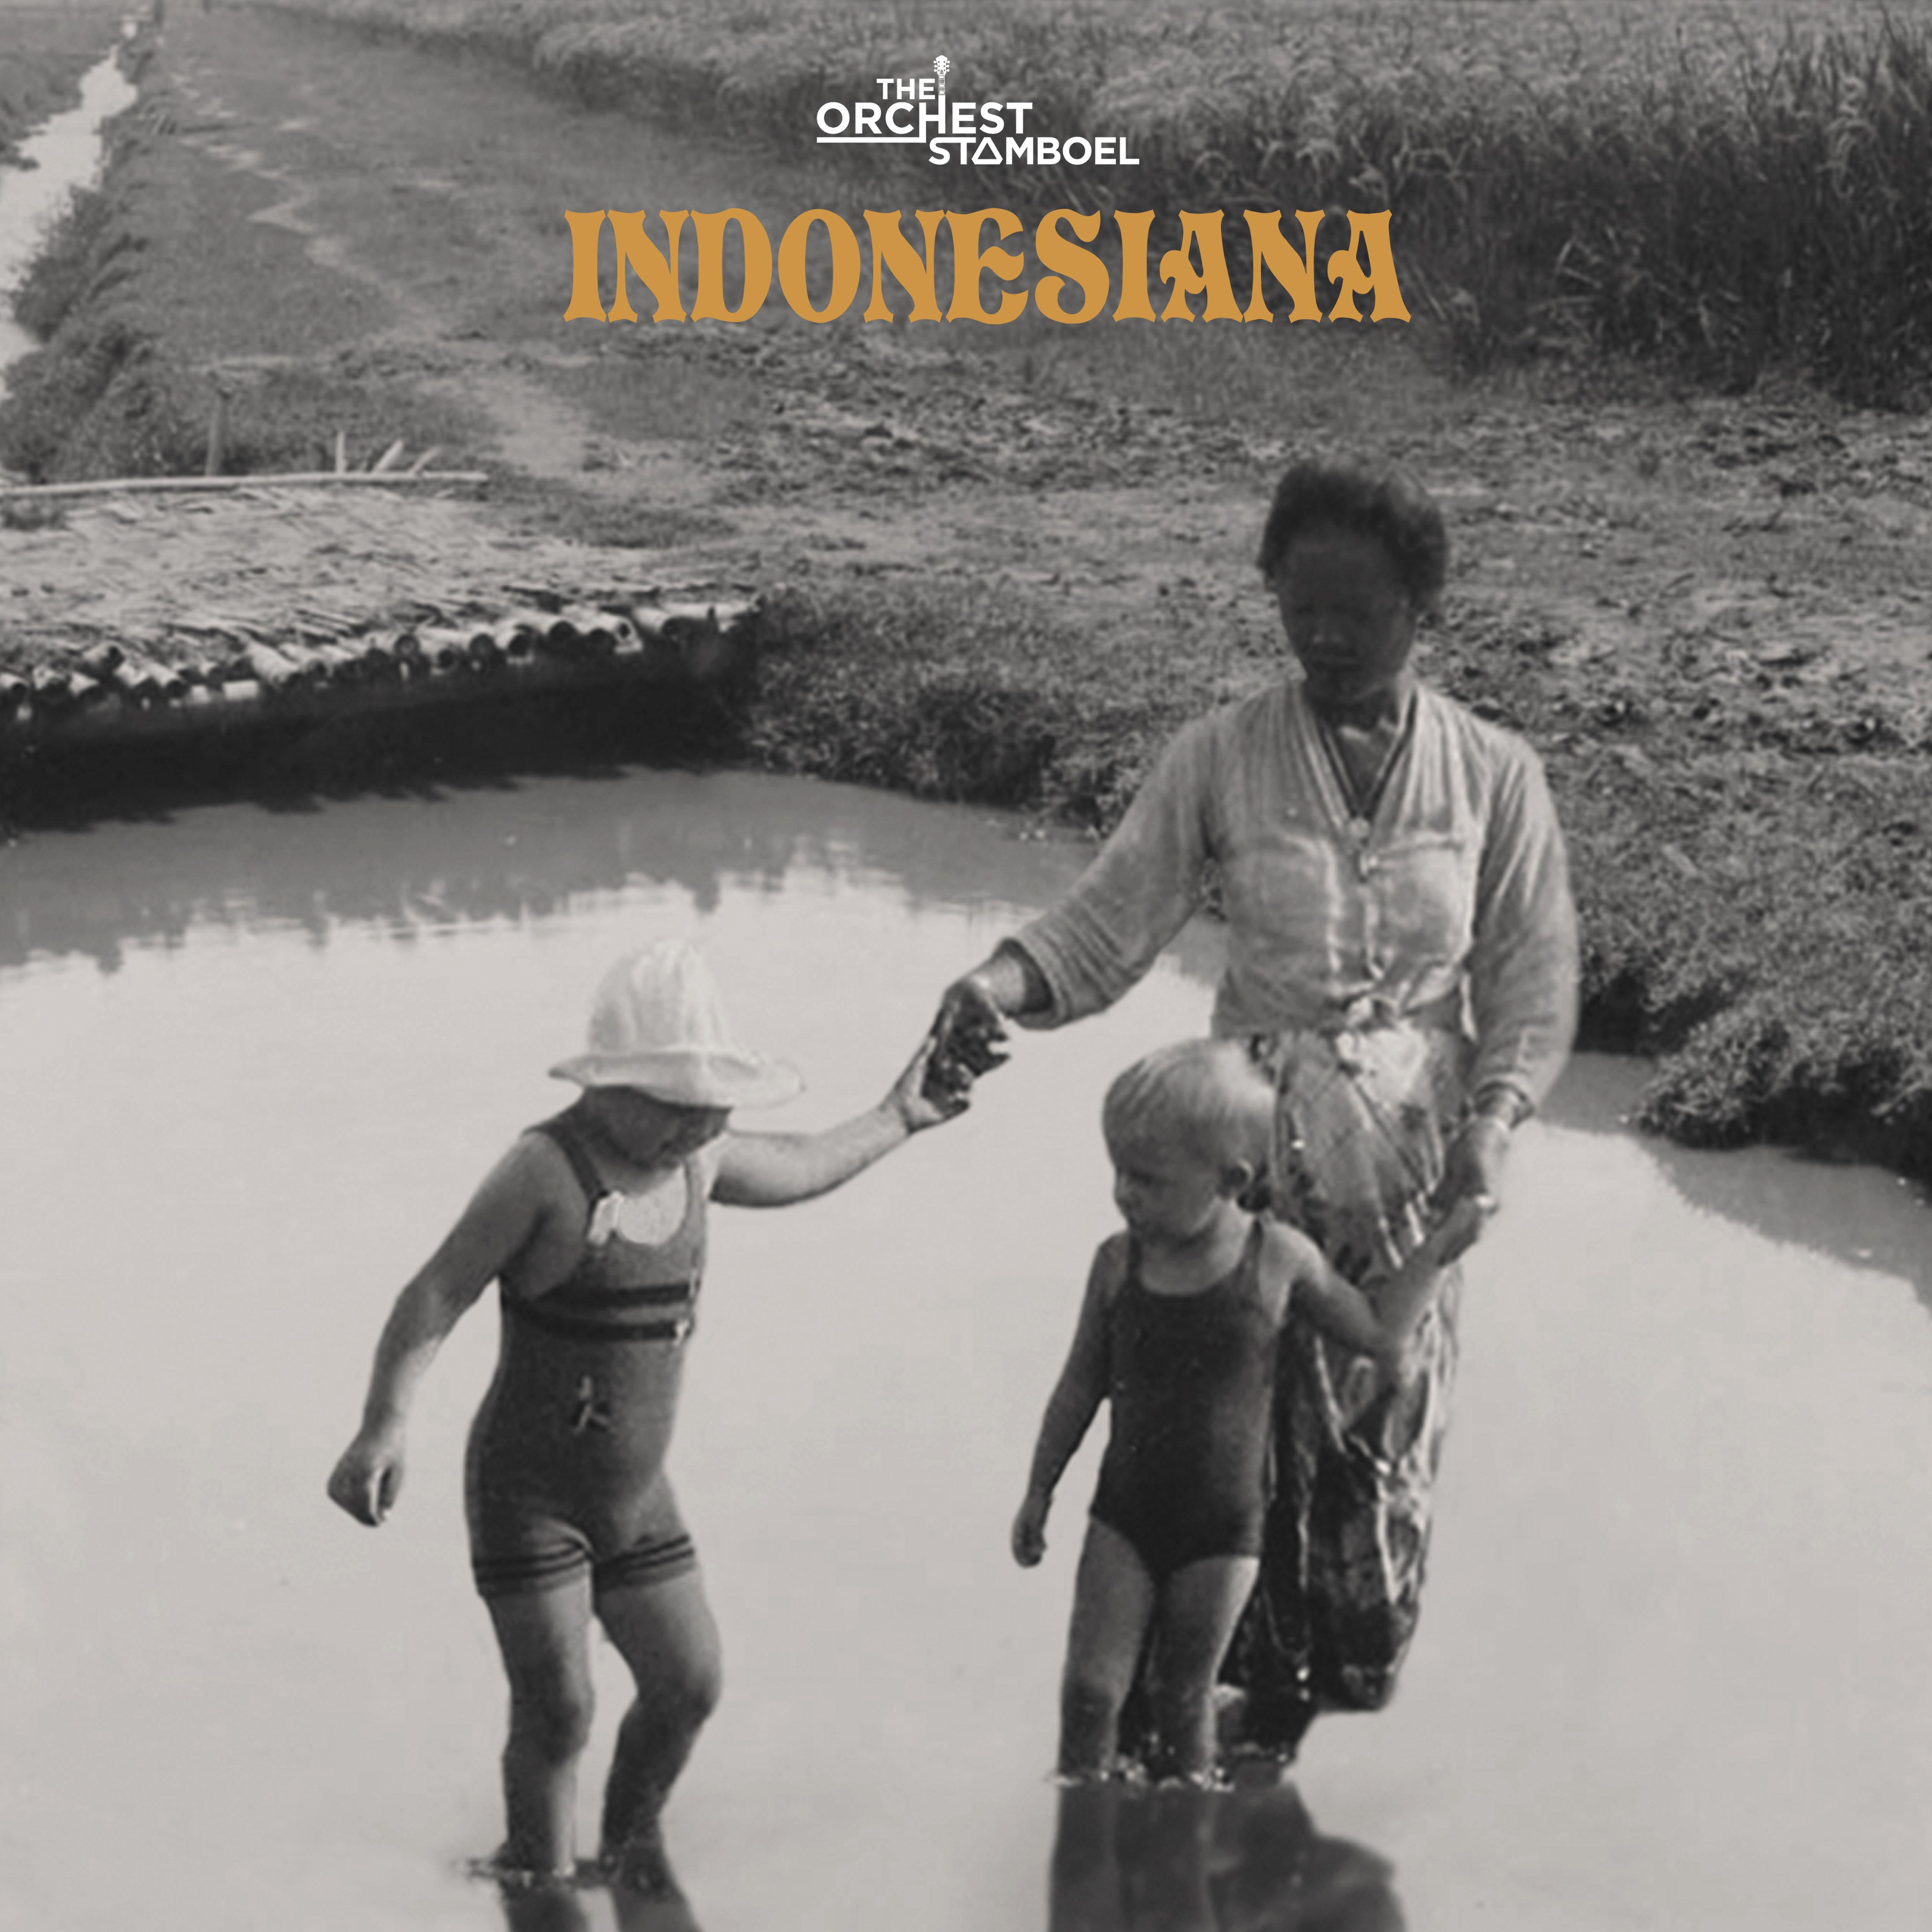 Indonesiana, album istimewa Orchest Stamboel